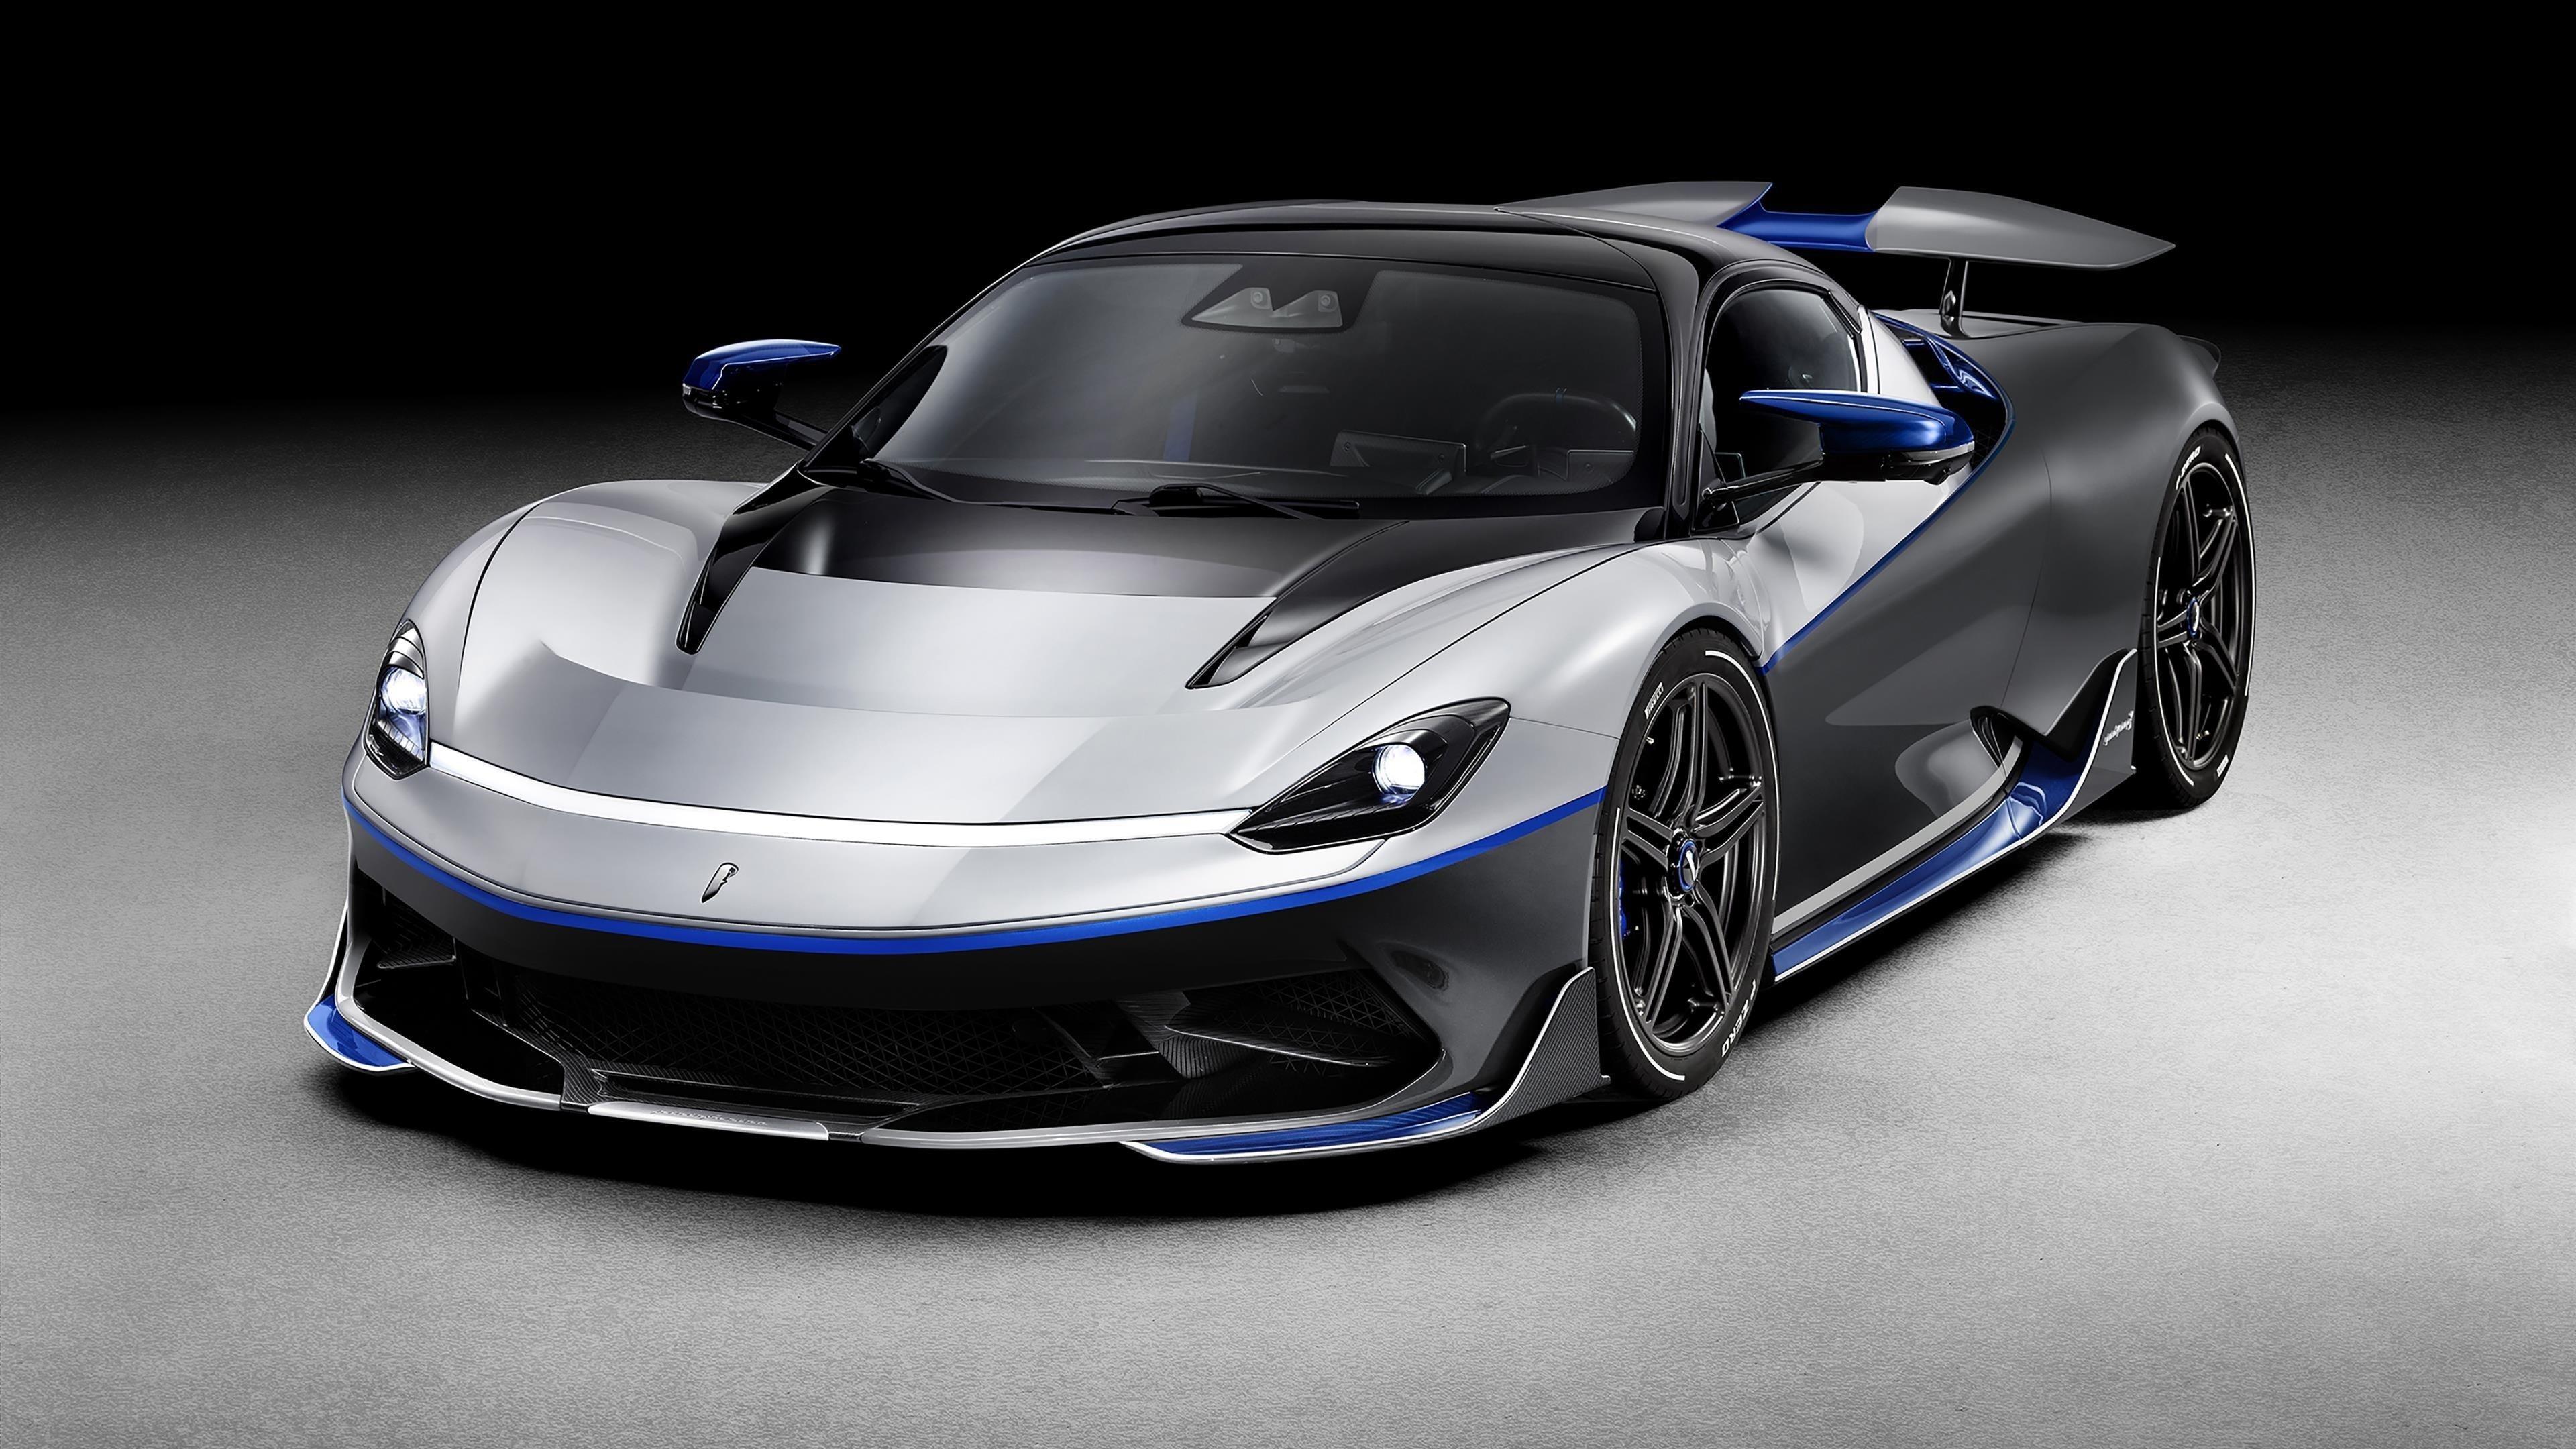 Pininfarina battista anniversario 2020 автомобили обои скачать